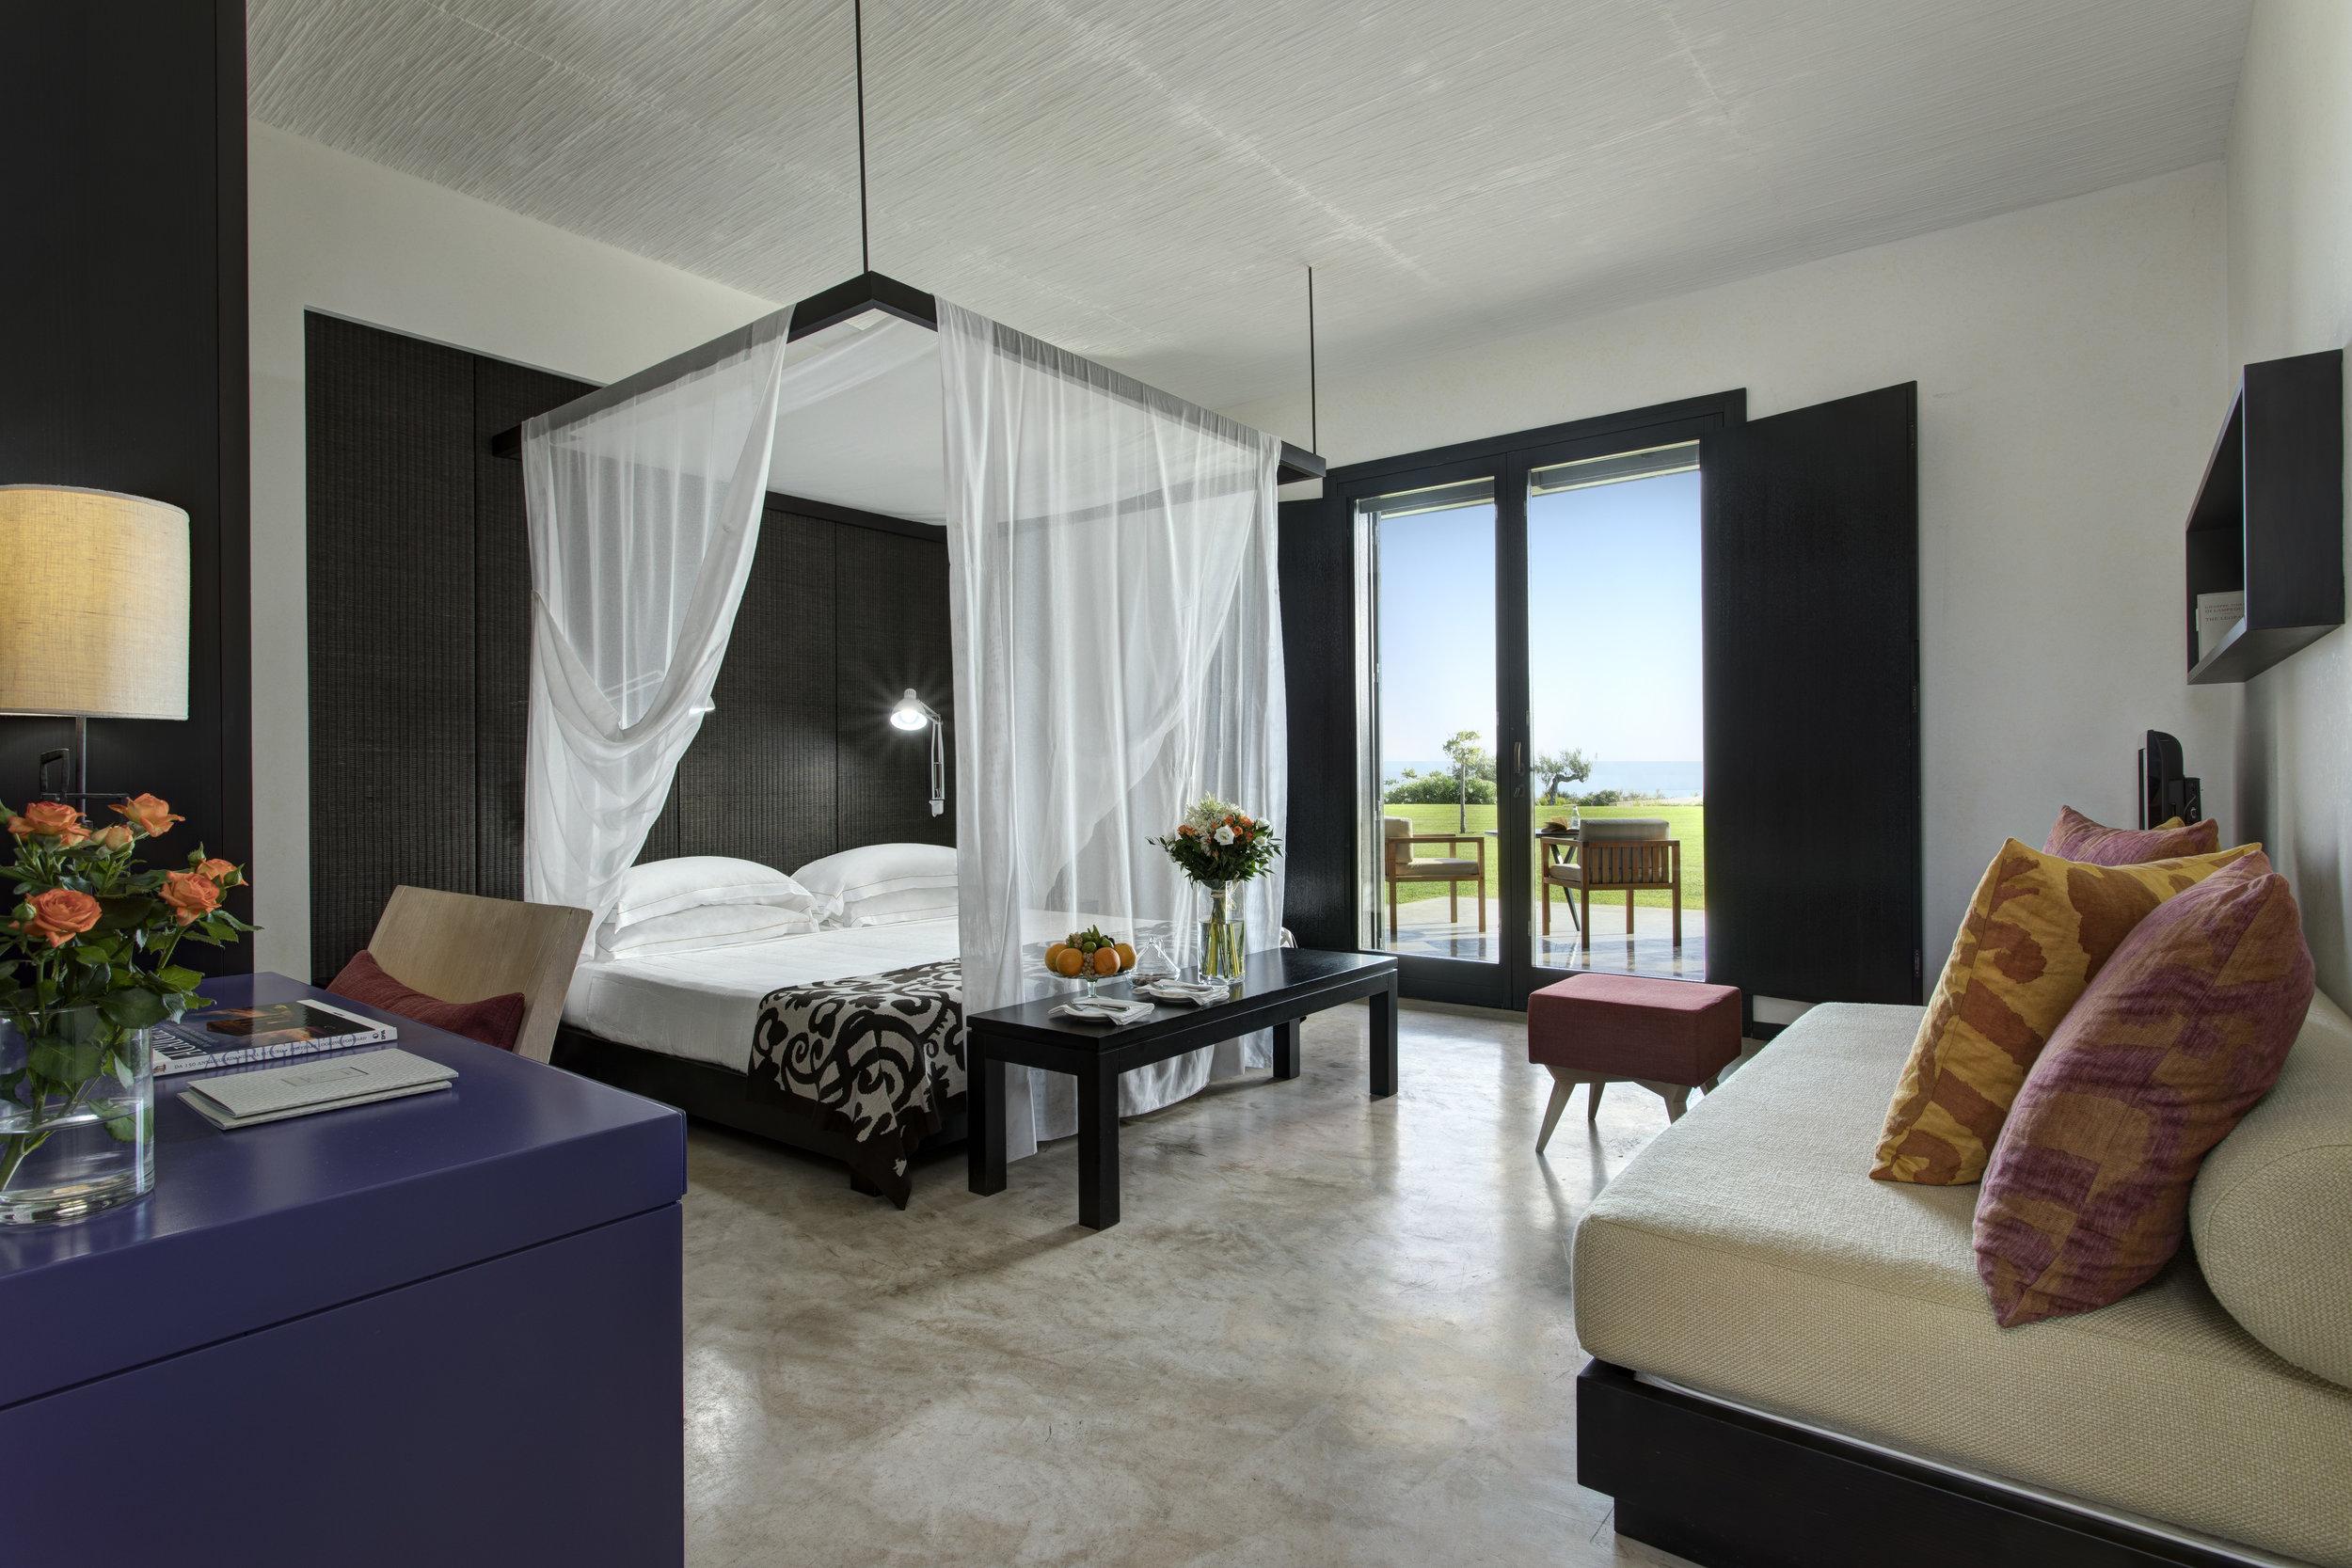 38 RFH Verdura Resort - Superior Deluxe Sea View Room 4186 Jul 17.JPG